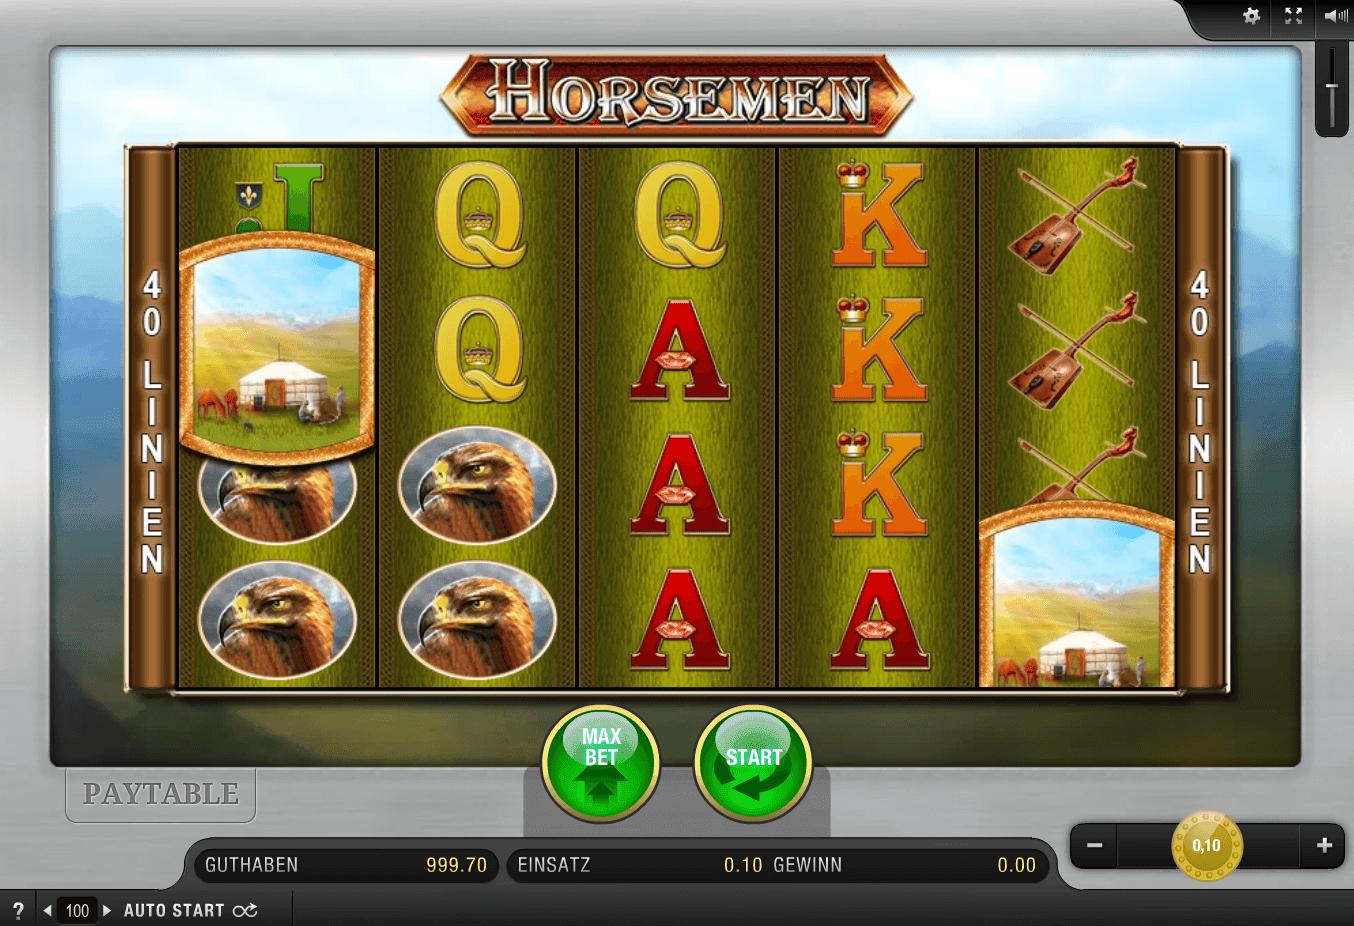 Palace of chance 100 free spins plentiful treasure